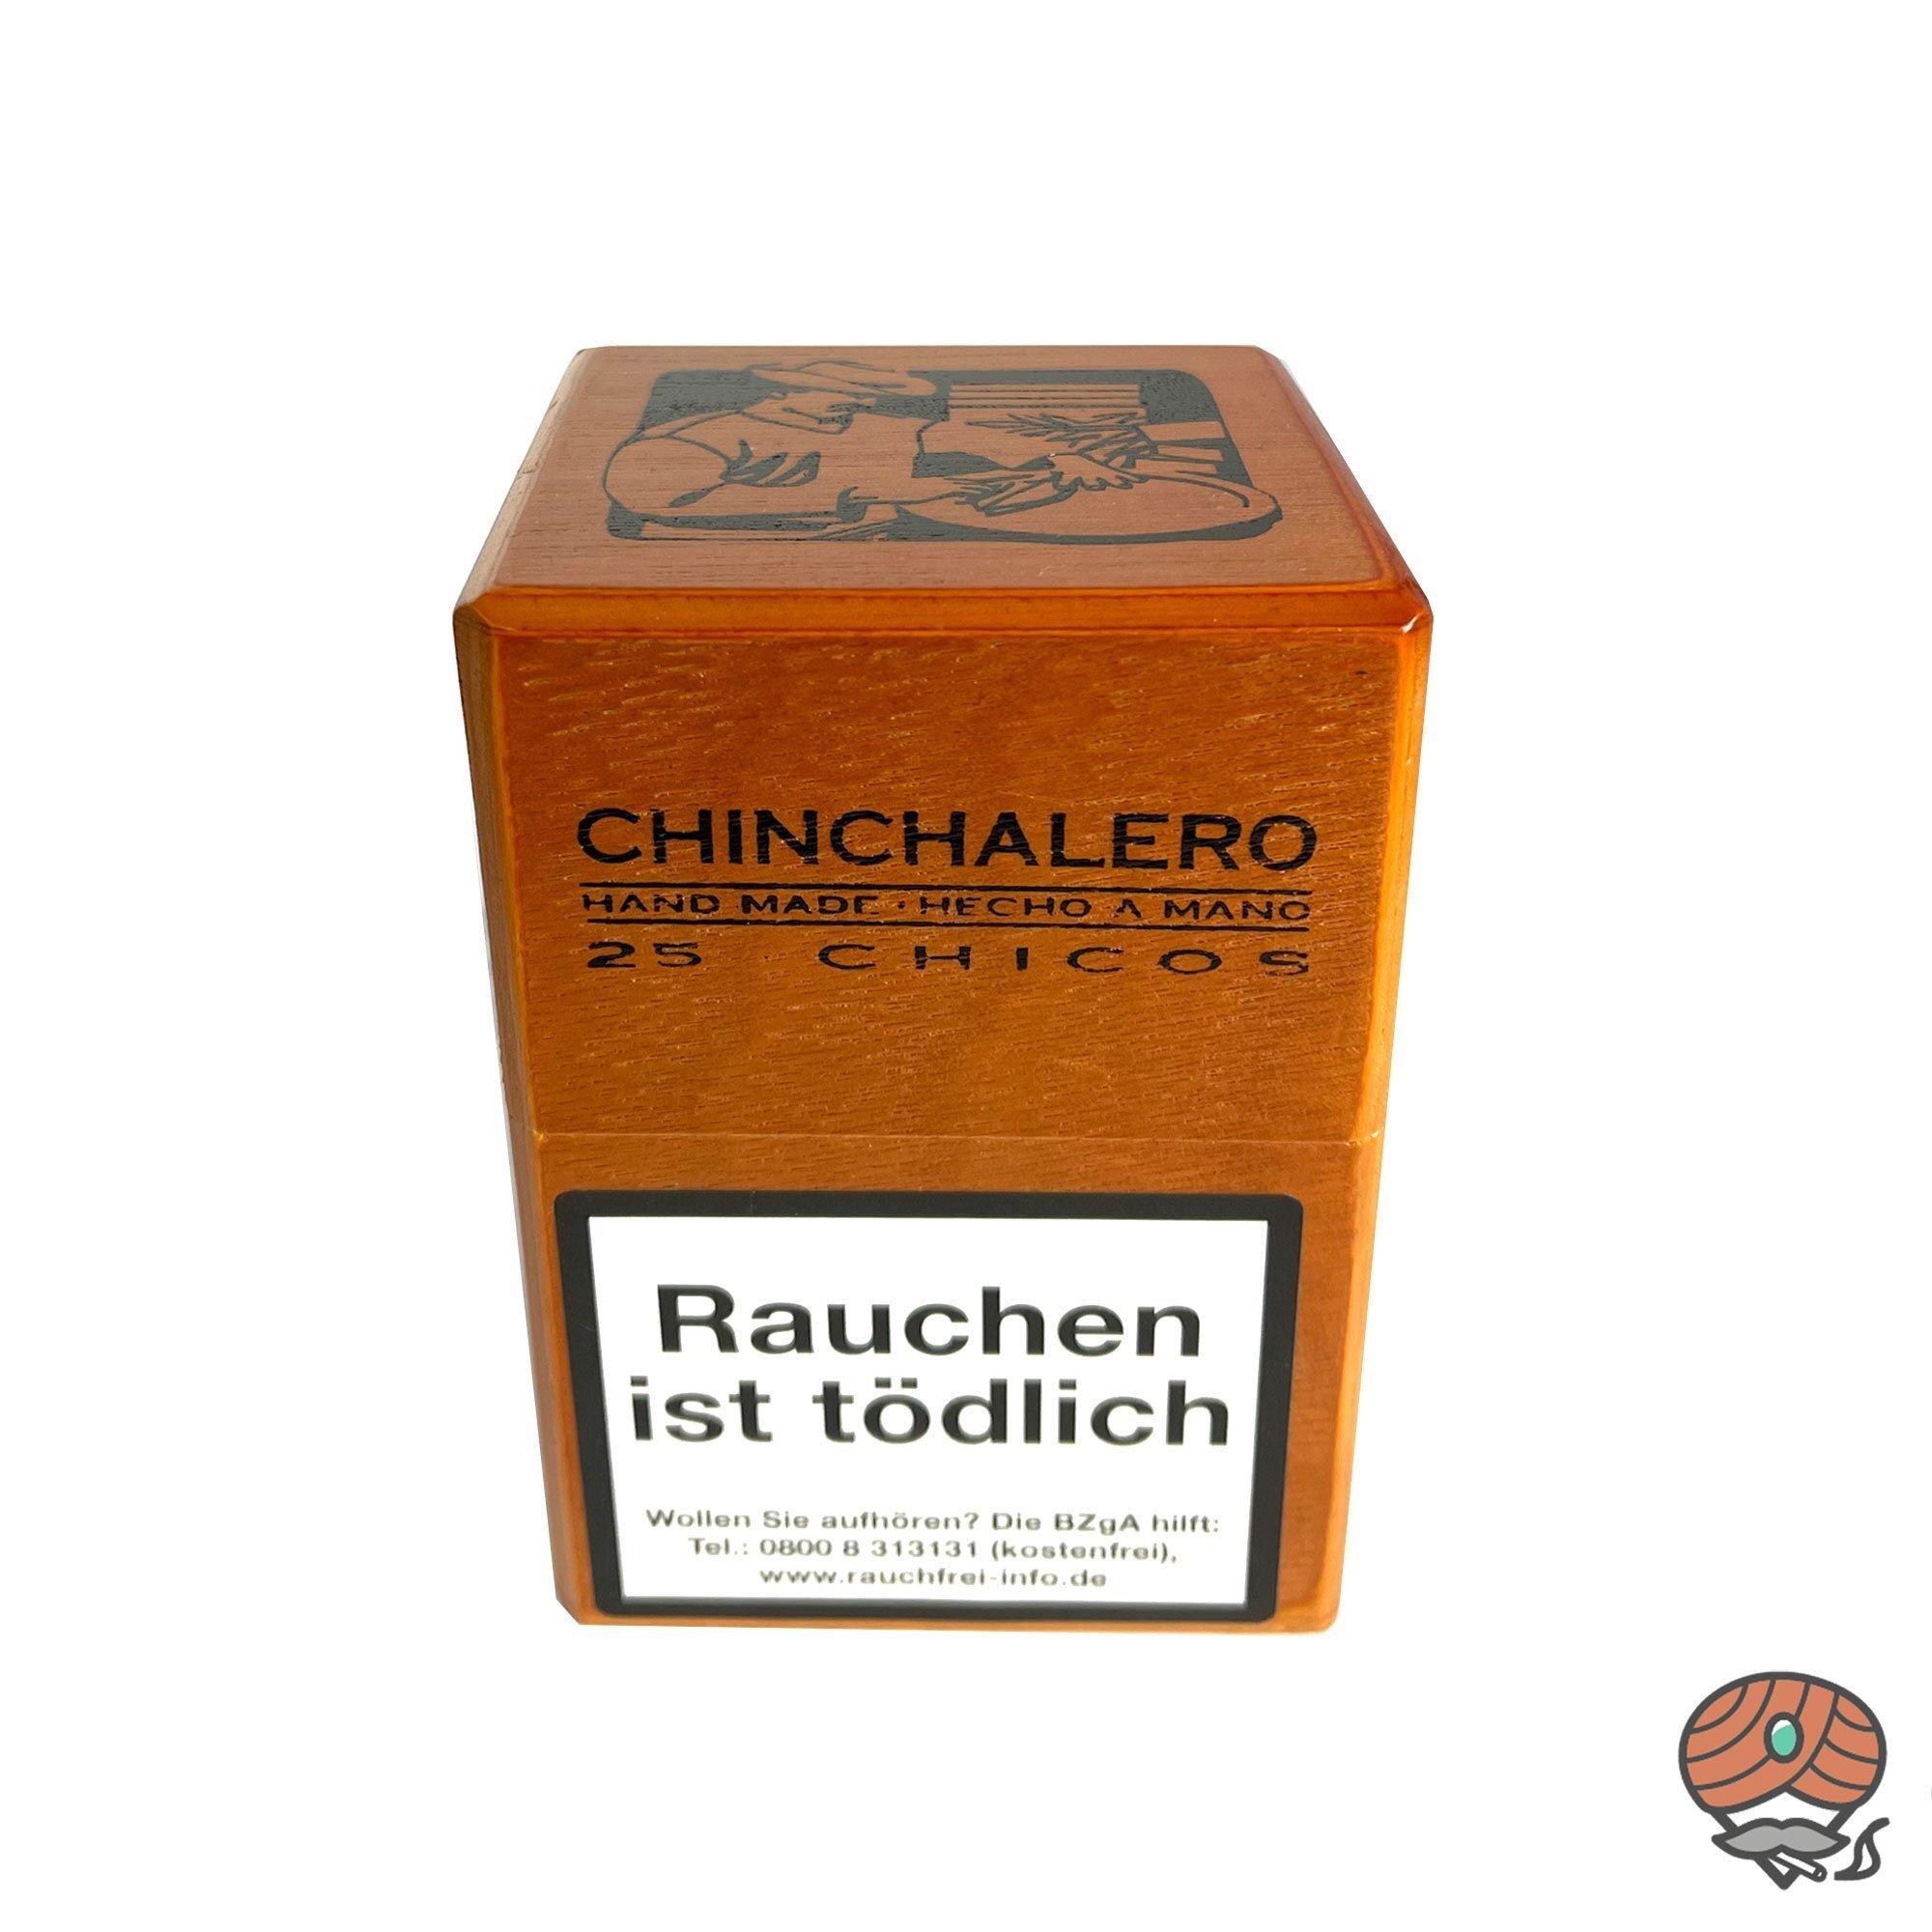 25 Chinchalero Classic Chico Zigarren aus Nicaragua